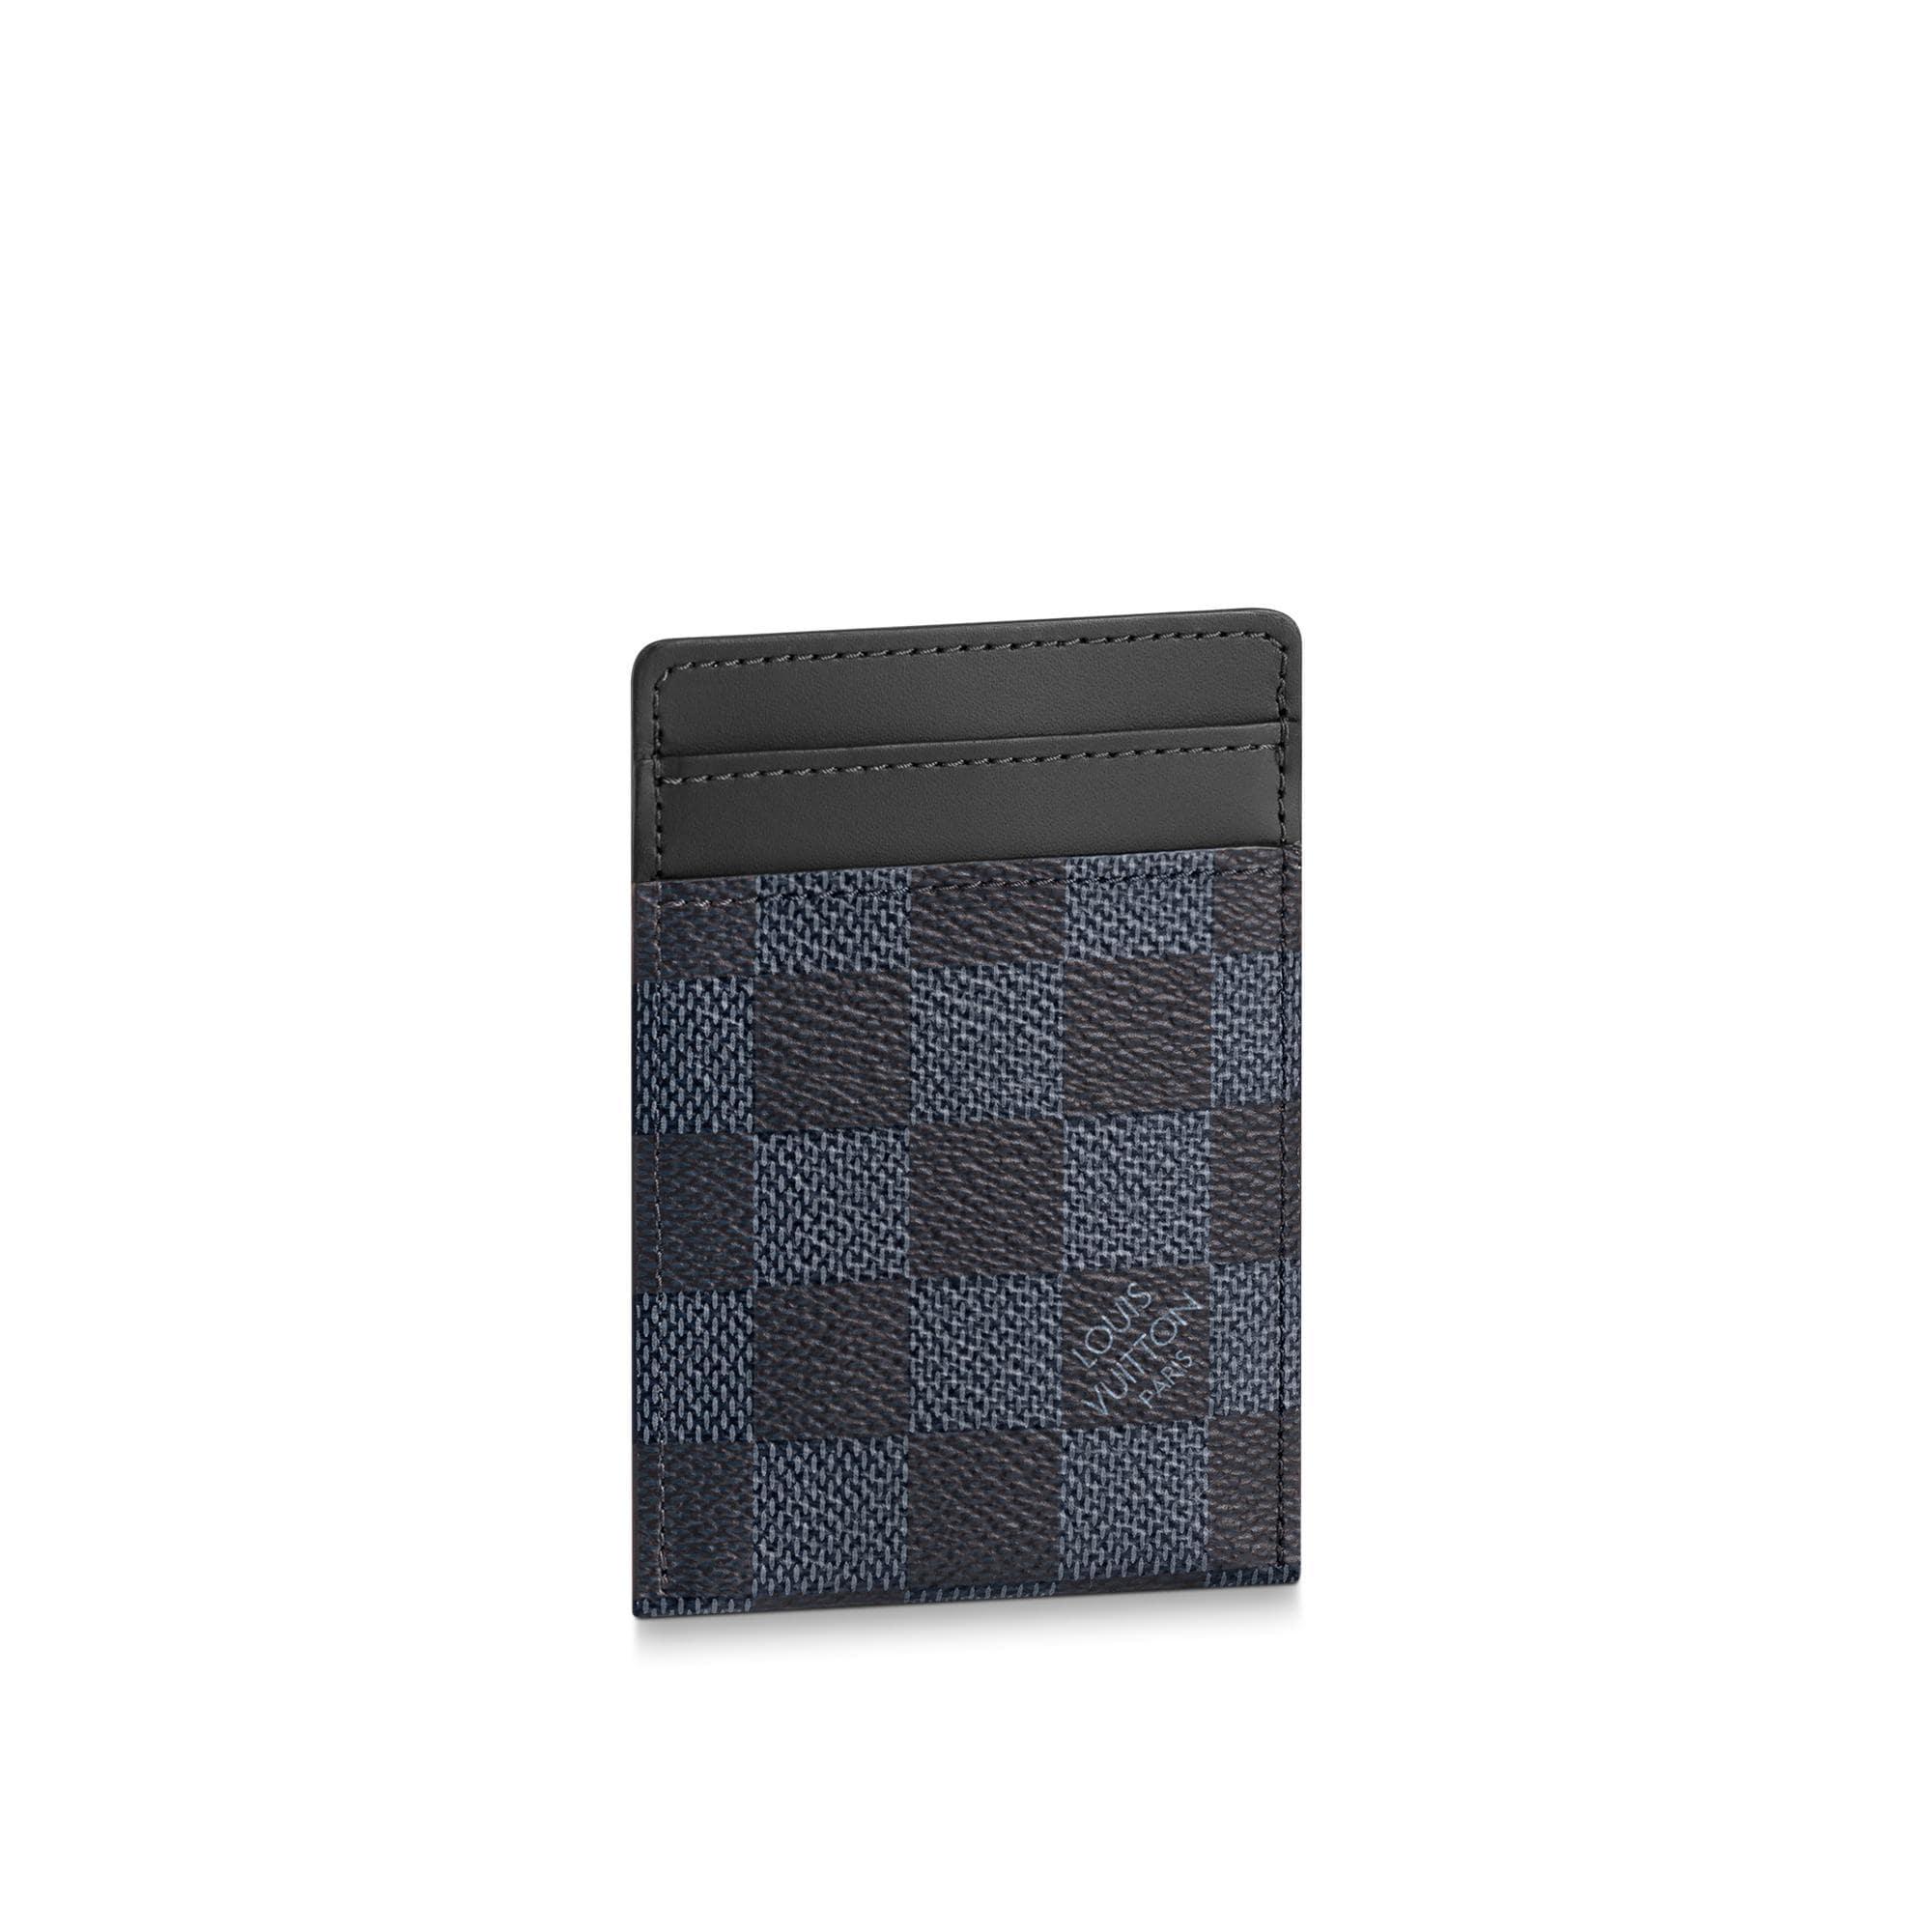 Card Holder Damier Cobalt Canvas Small Leather Goods